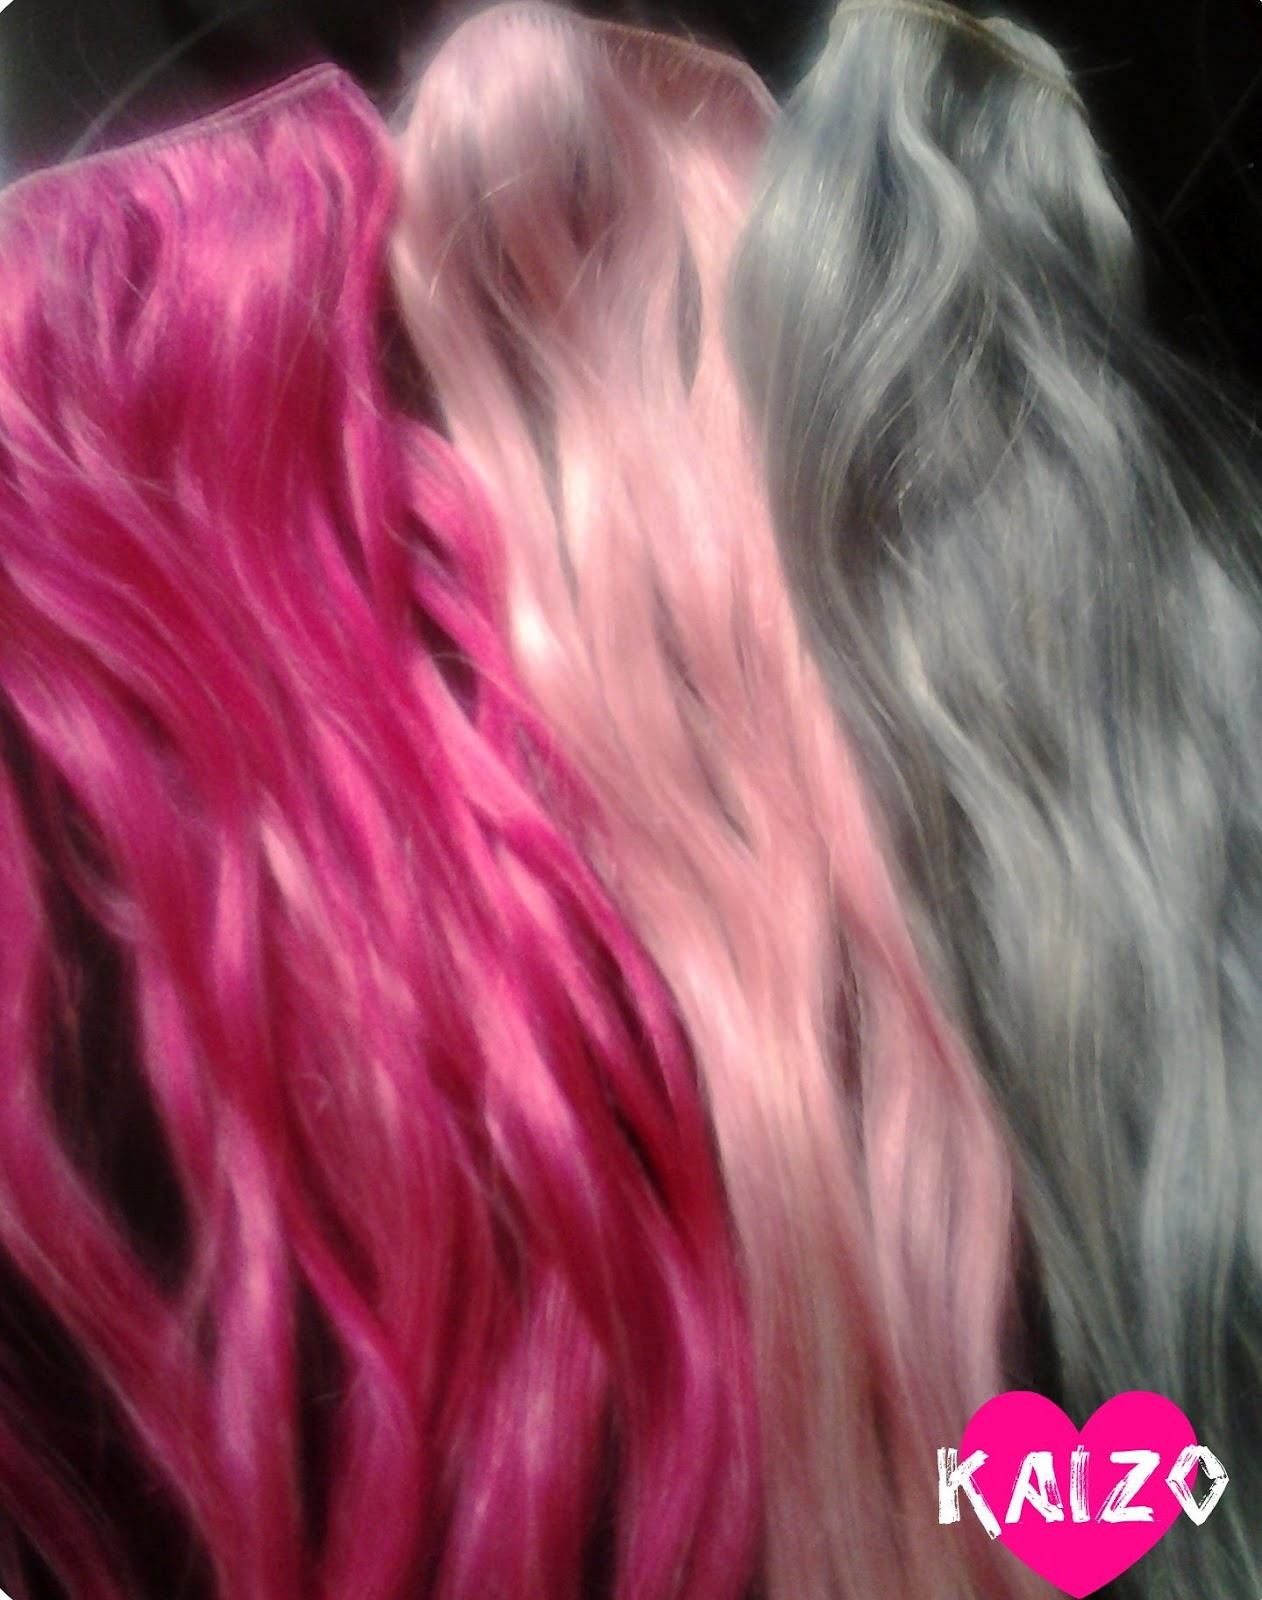 Pravana chromasilk vivids silver 19 free hair color pictures of 29 kaizo pravana chromasilk vivids haircolor review nvjuhfo Images